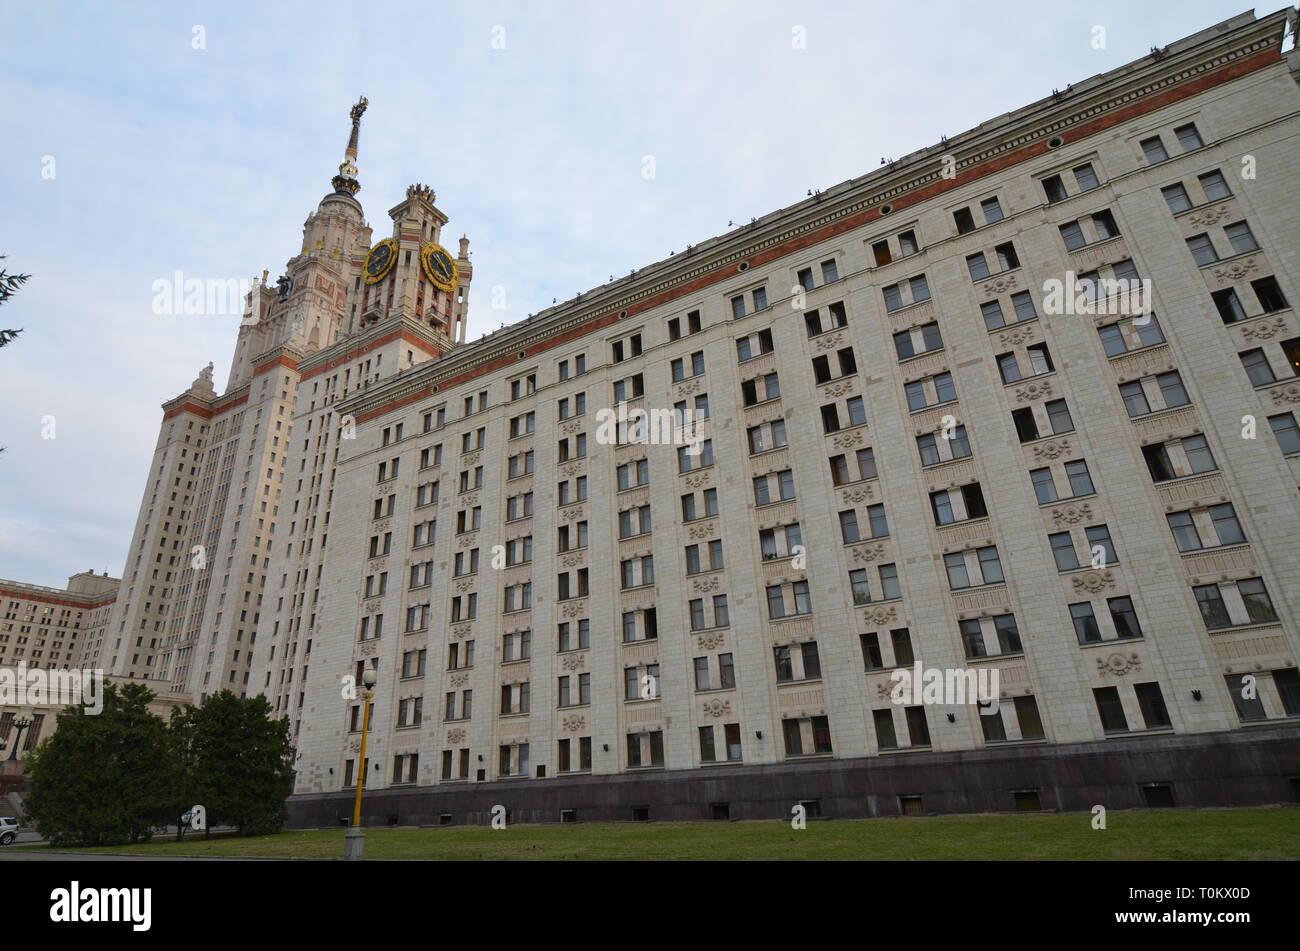 Lomonosov Moscow State University (MSU), Moscow, Russia Stock Photo